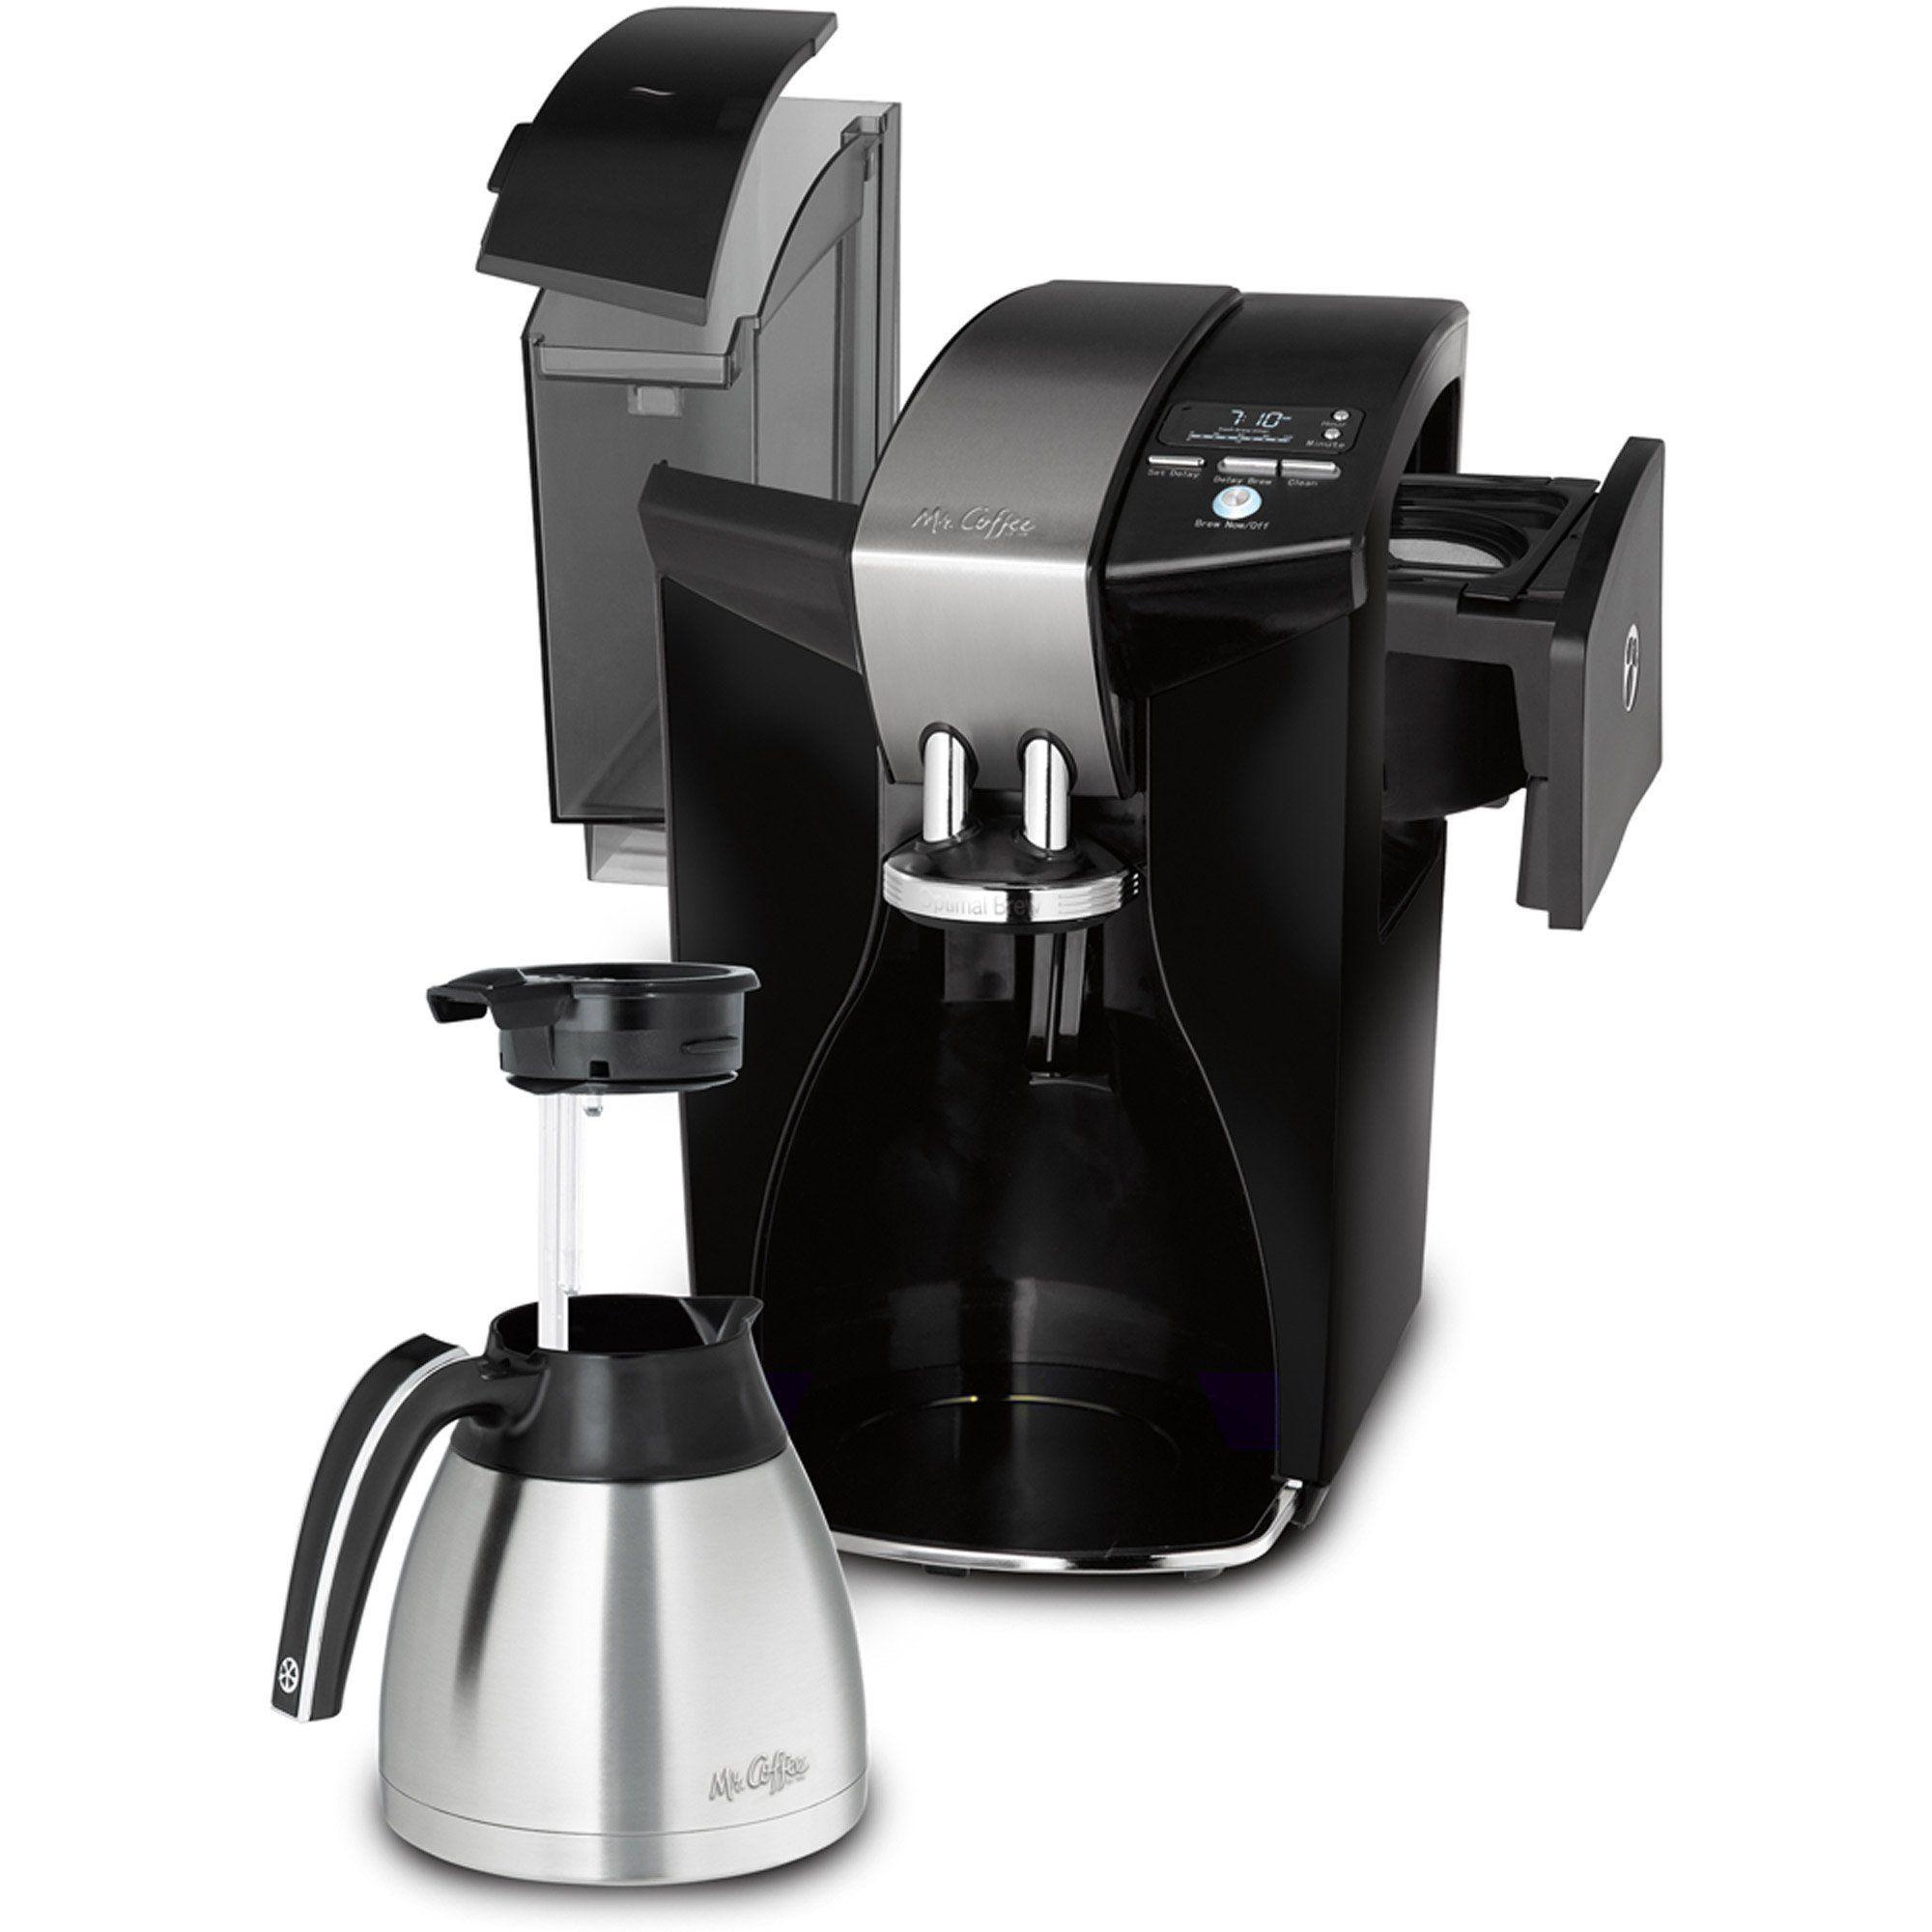 De'Longhi Scultura Traditional Pump Espresso Coffee